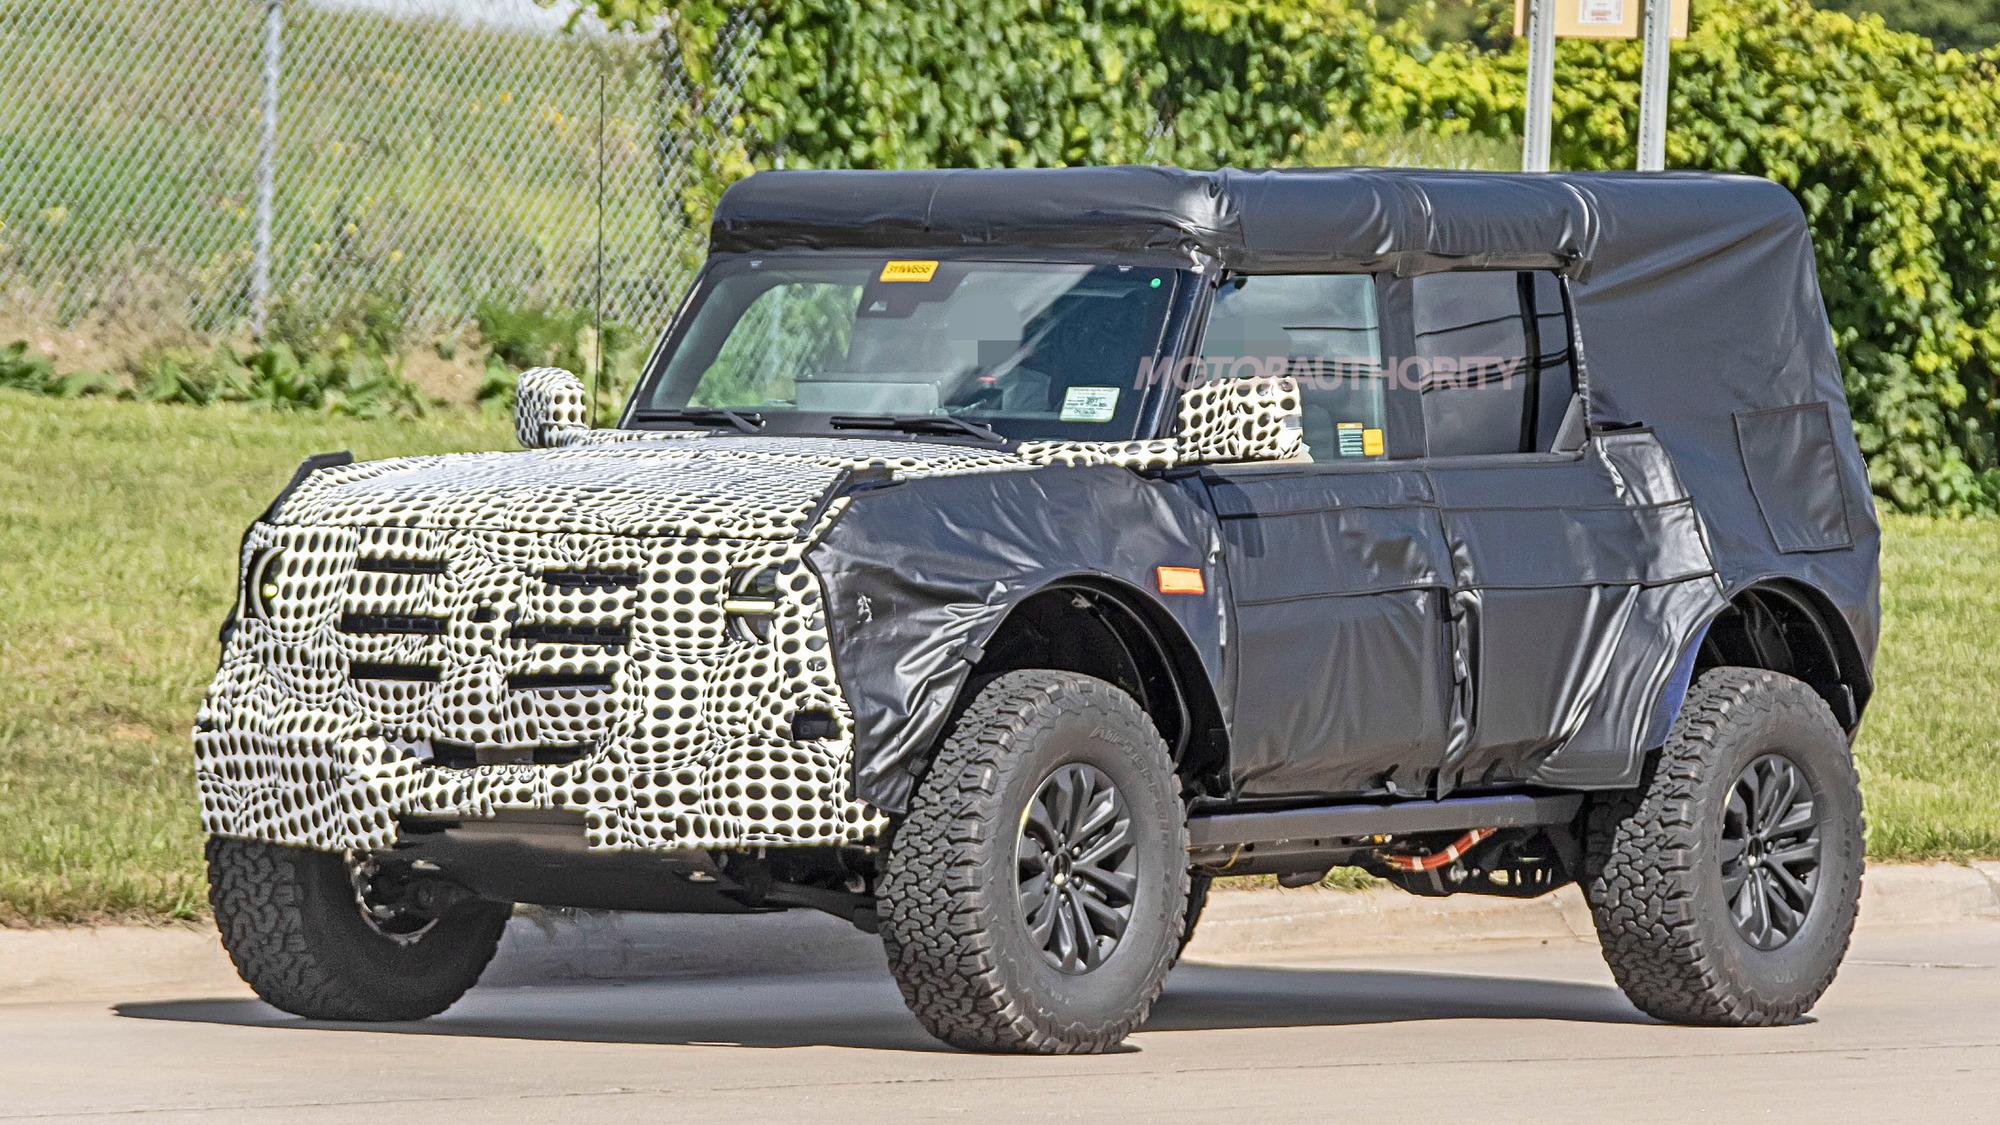 2021 Ford Bronco Raptor (or Warthog) spy shots